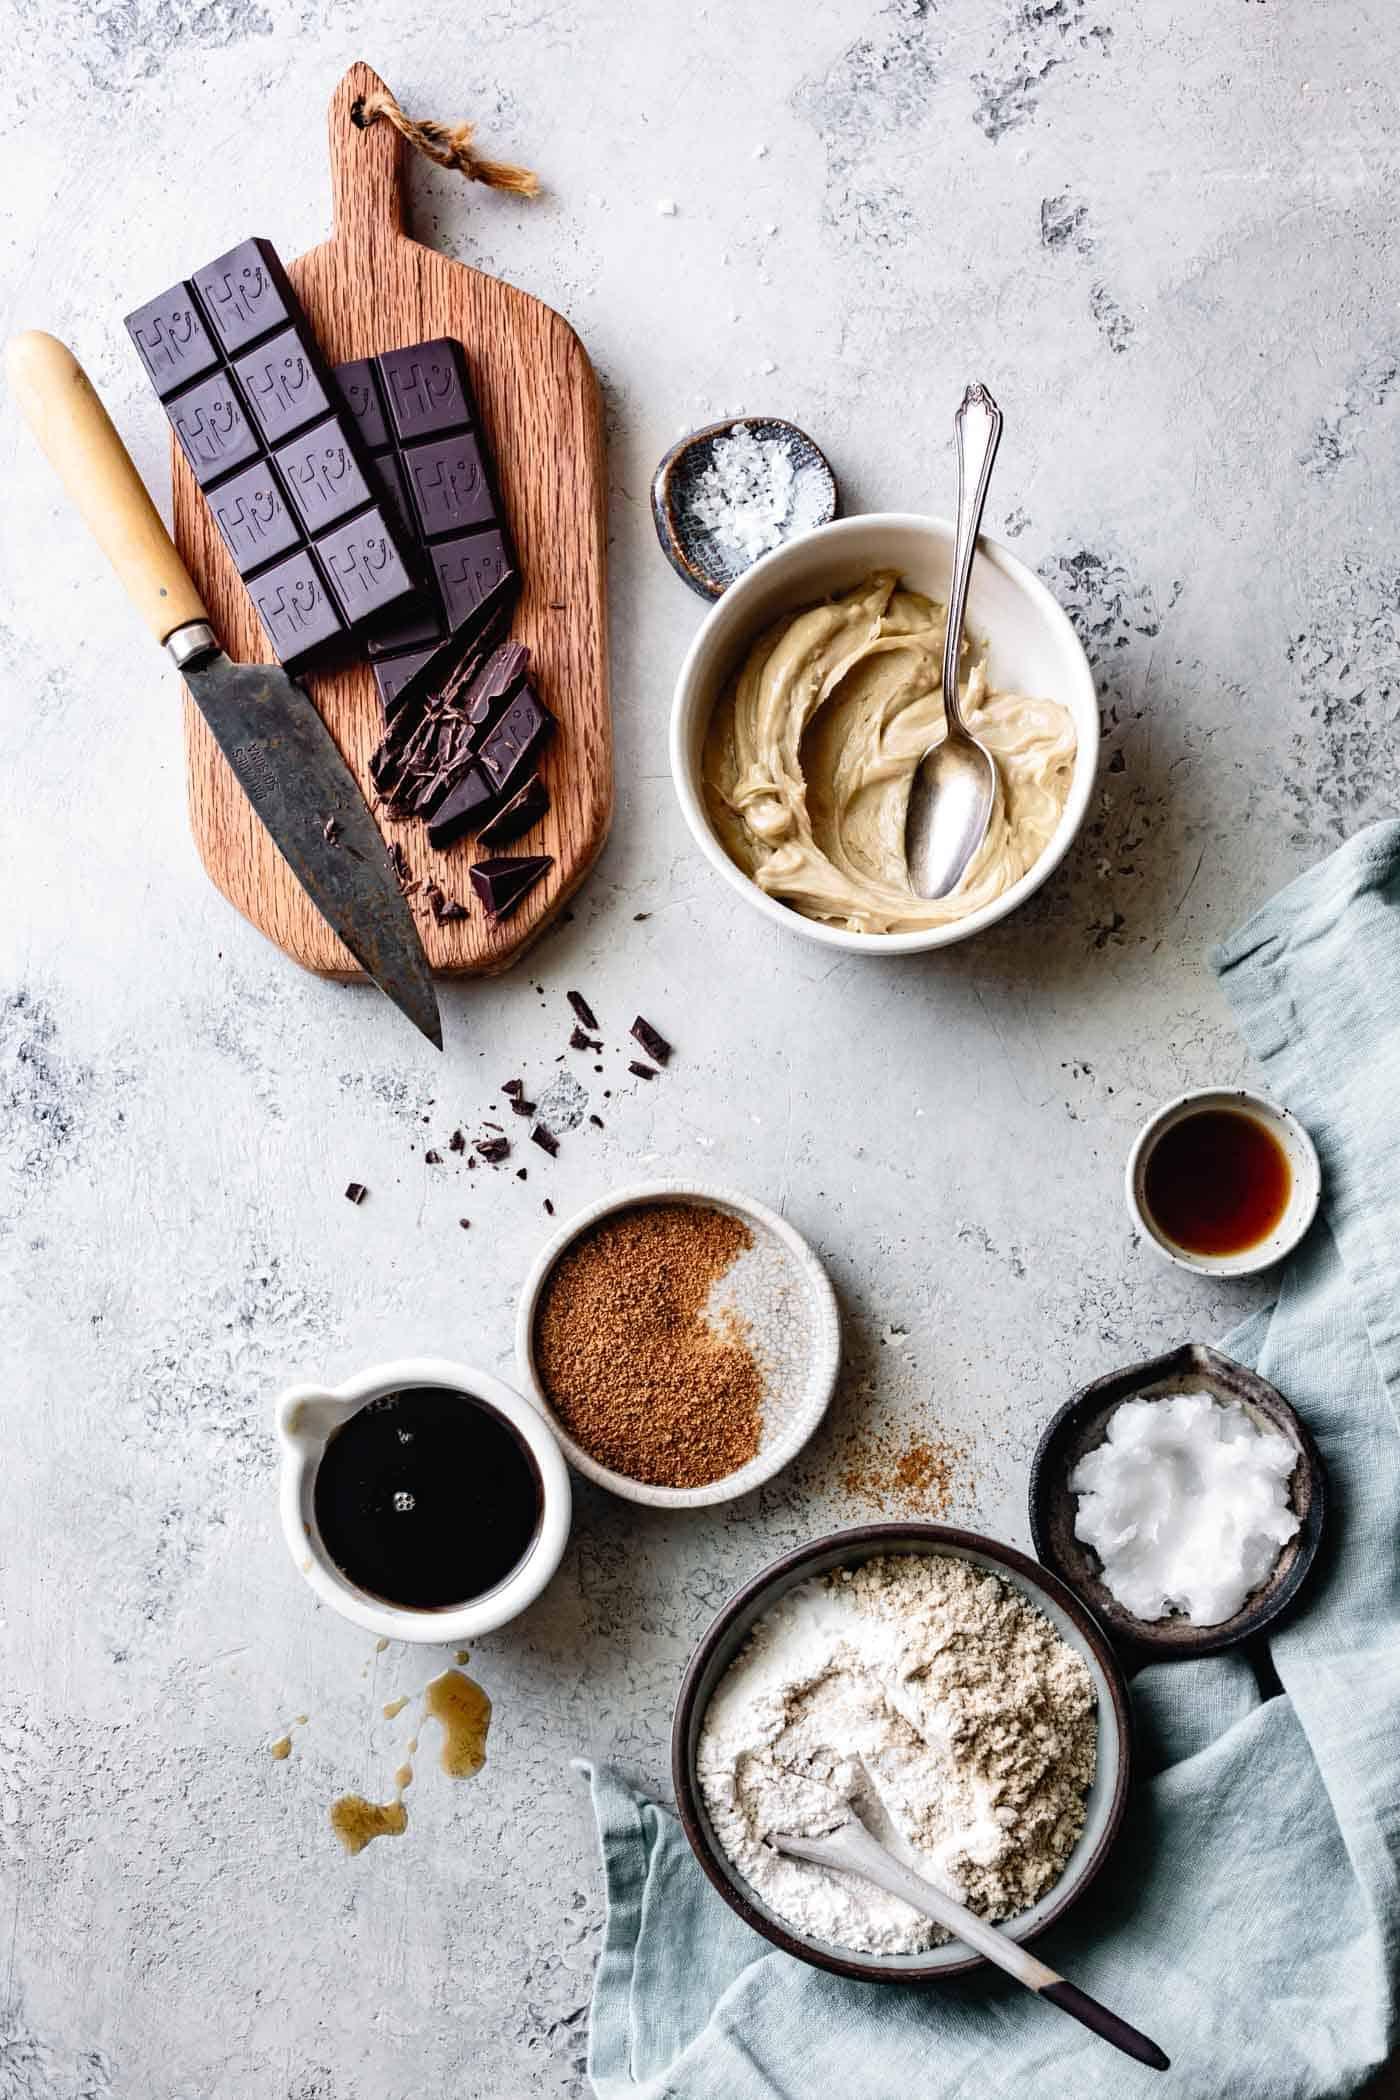 Paleo chocolate chip cookie ingredients